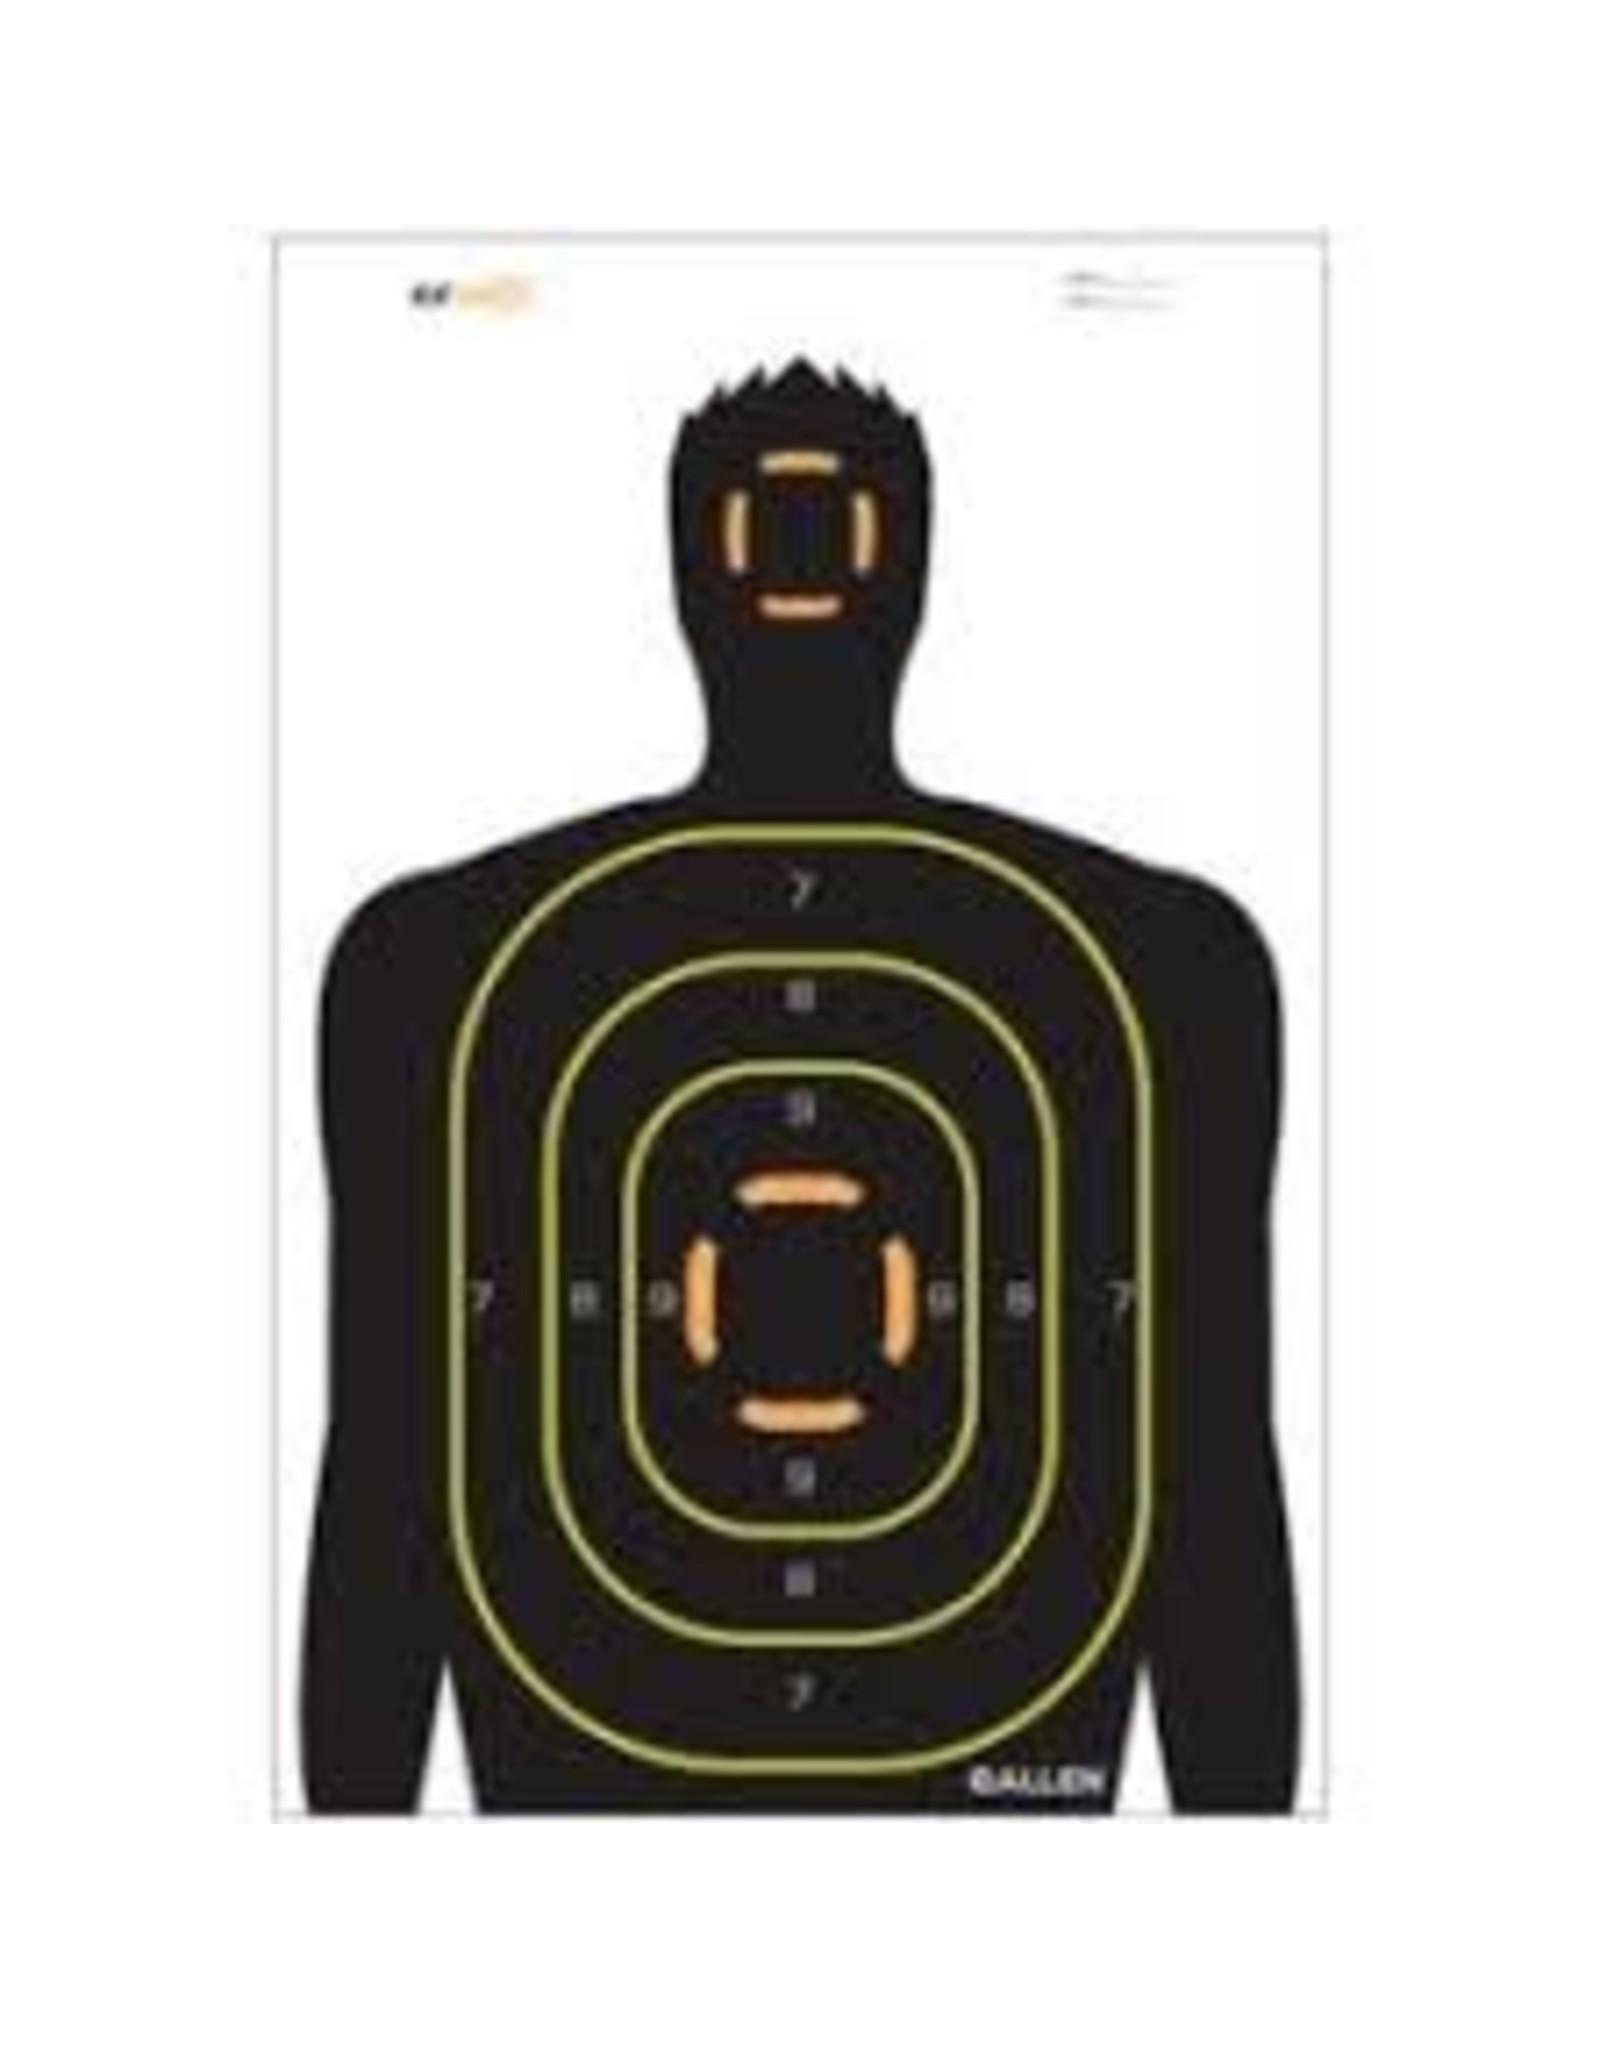 Allen Allen EZ Aim Non-Adhesive 12x18 Silhouette Target 5 Pack